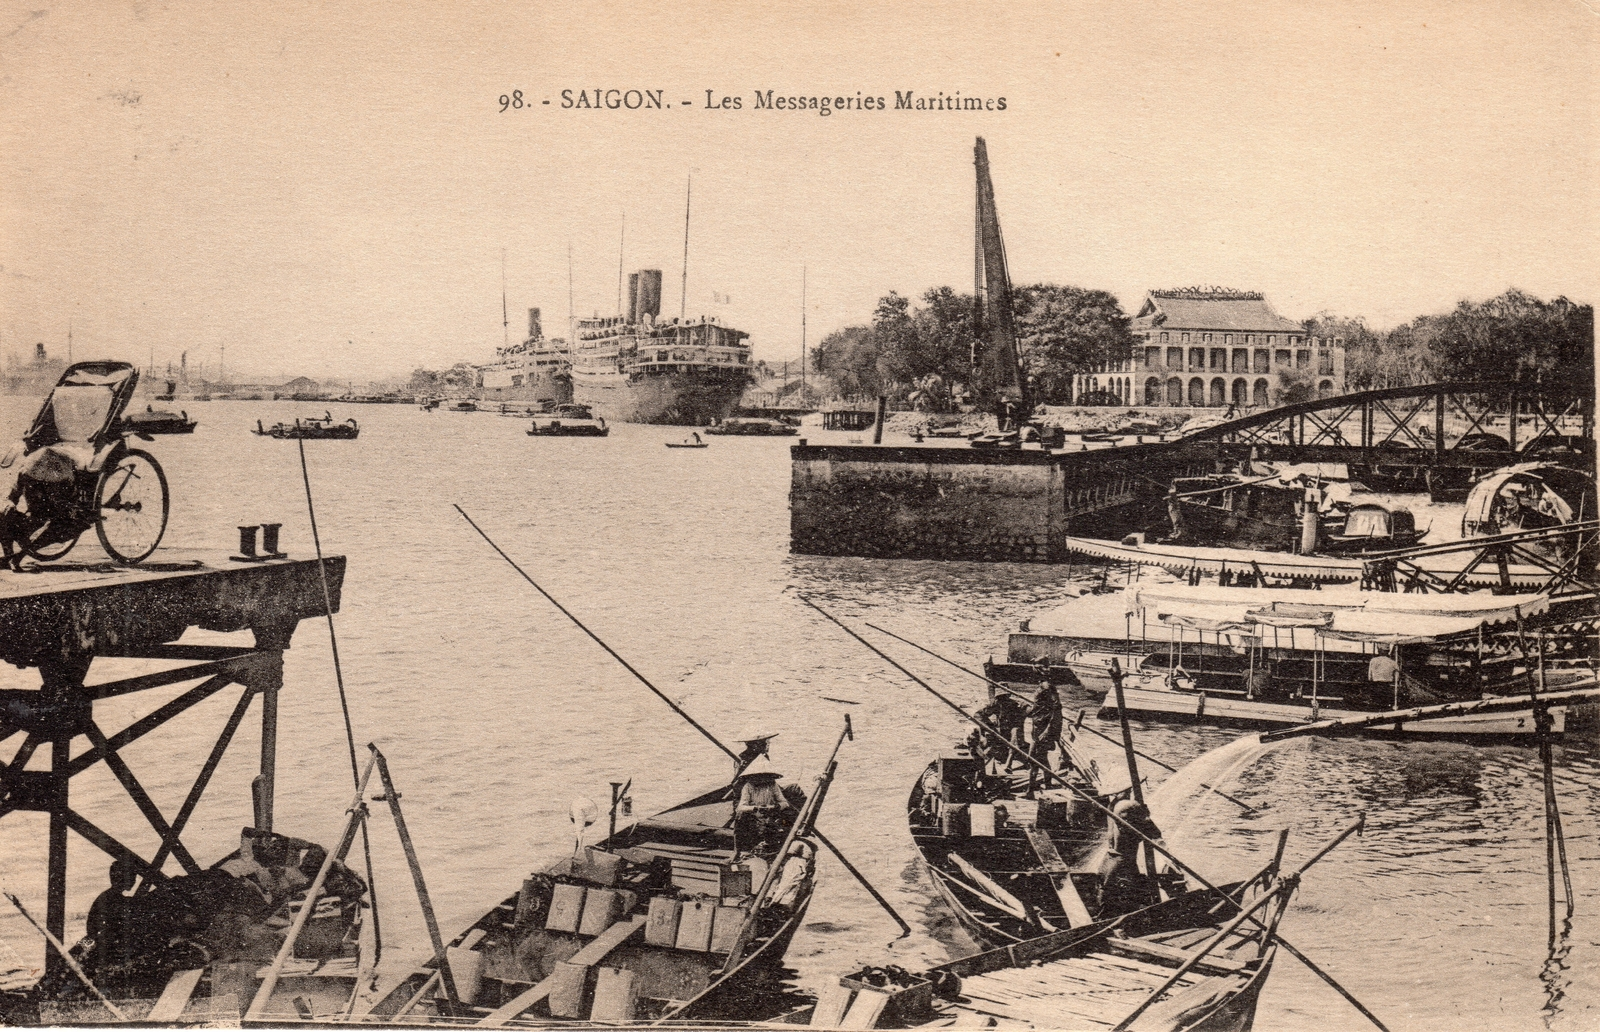 Saïgon -  Saïgon-Les Messageries Maritimes